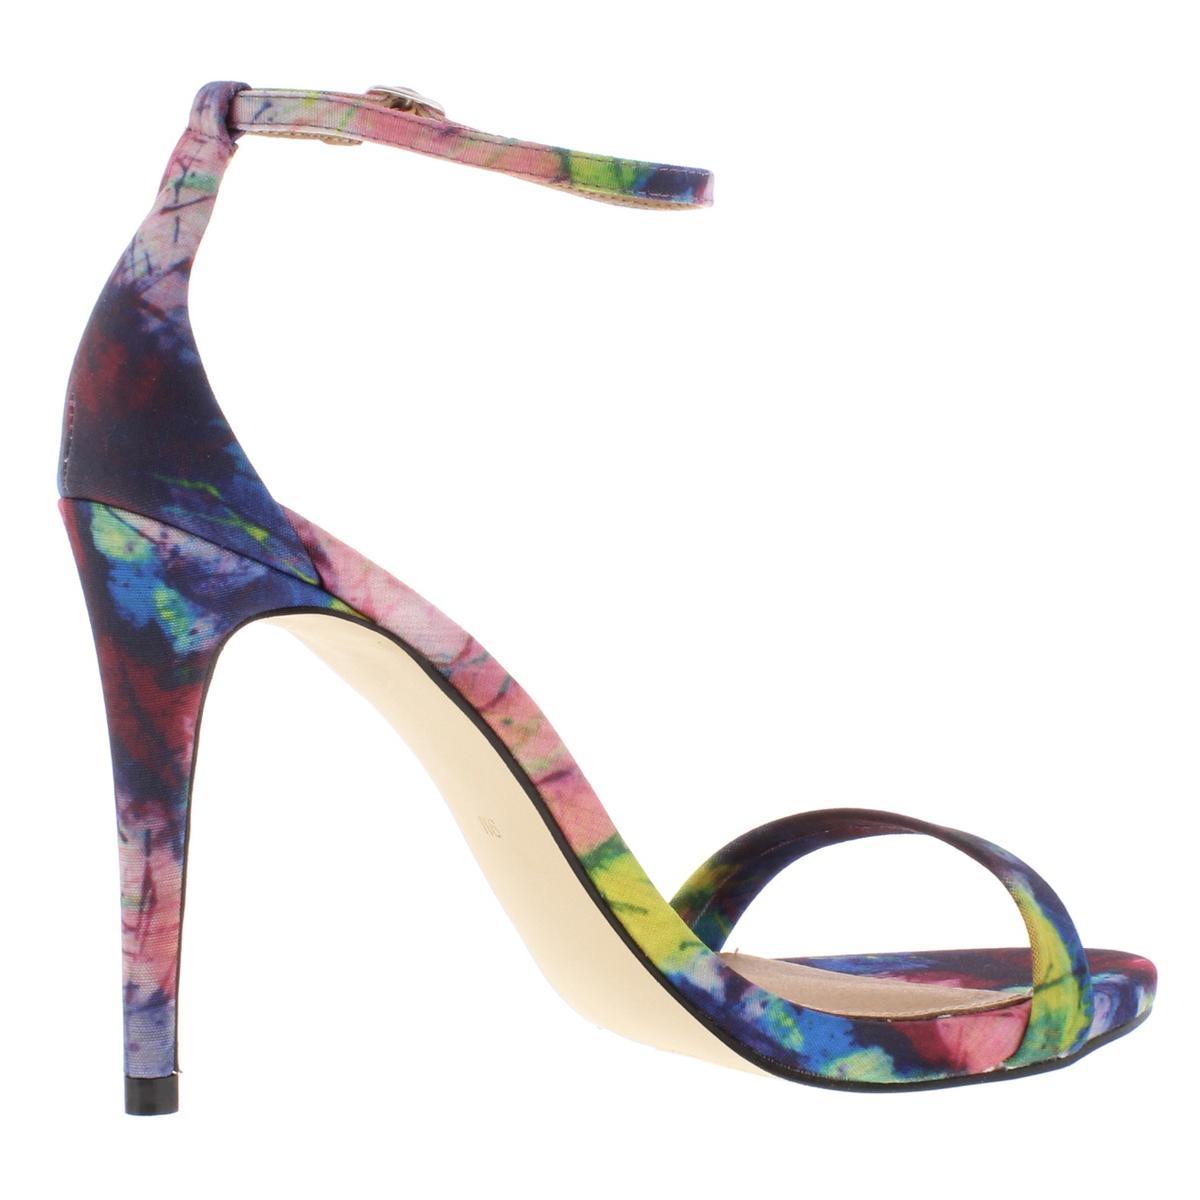 Steve-Madden-Womens-Stecy-Dress-Evening-Sandals-Shoes-BHFO-6444 thumbnail 4